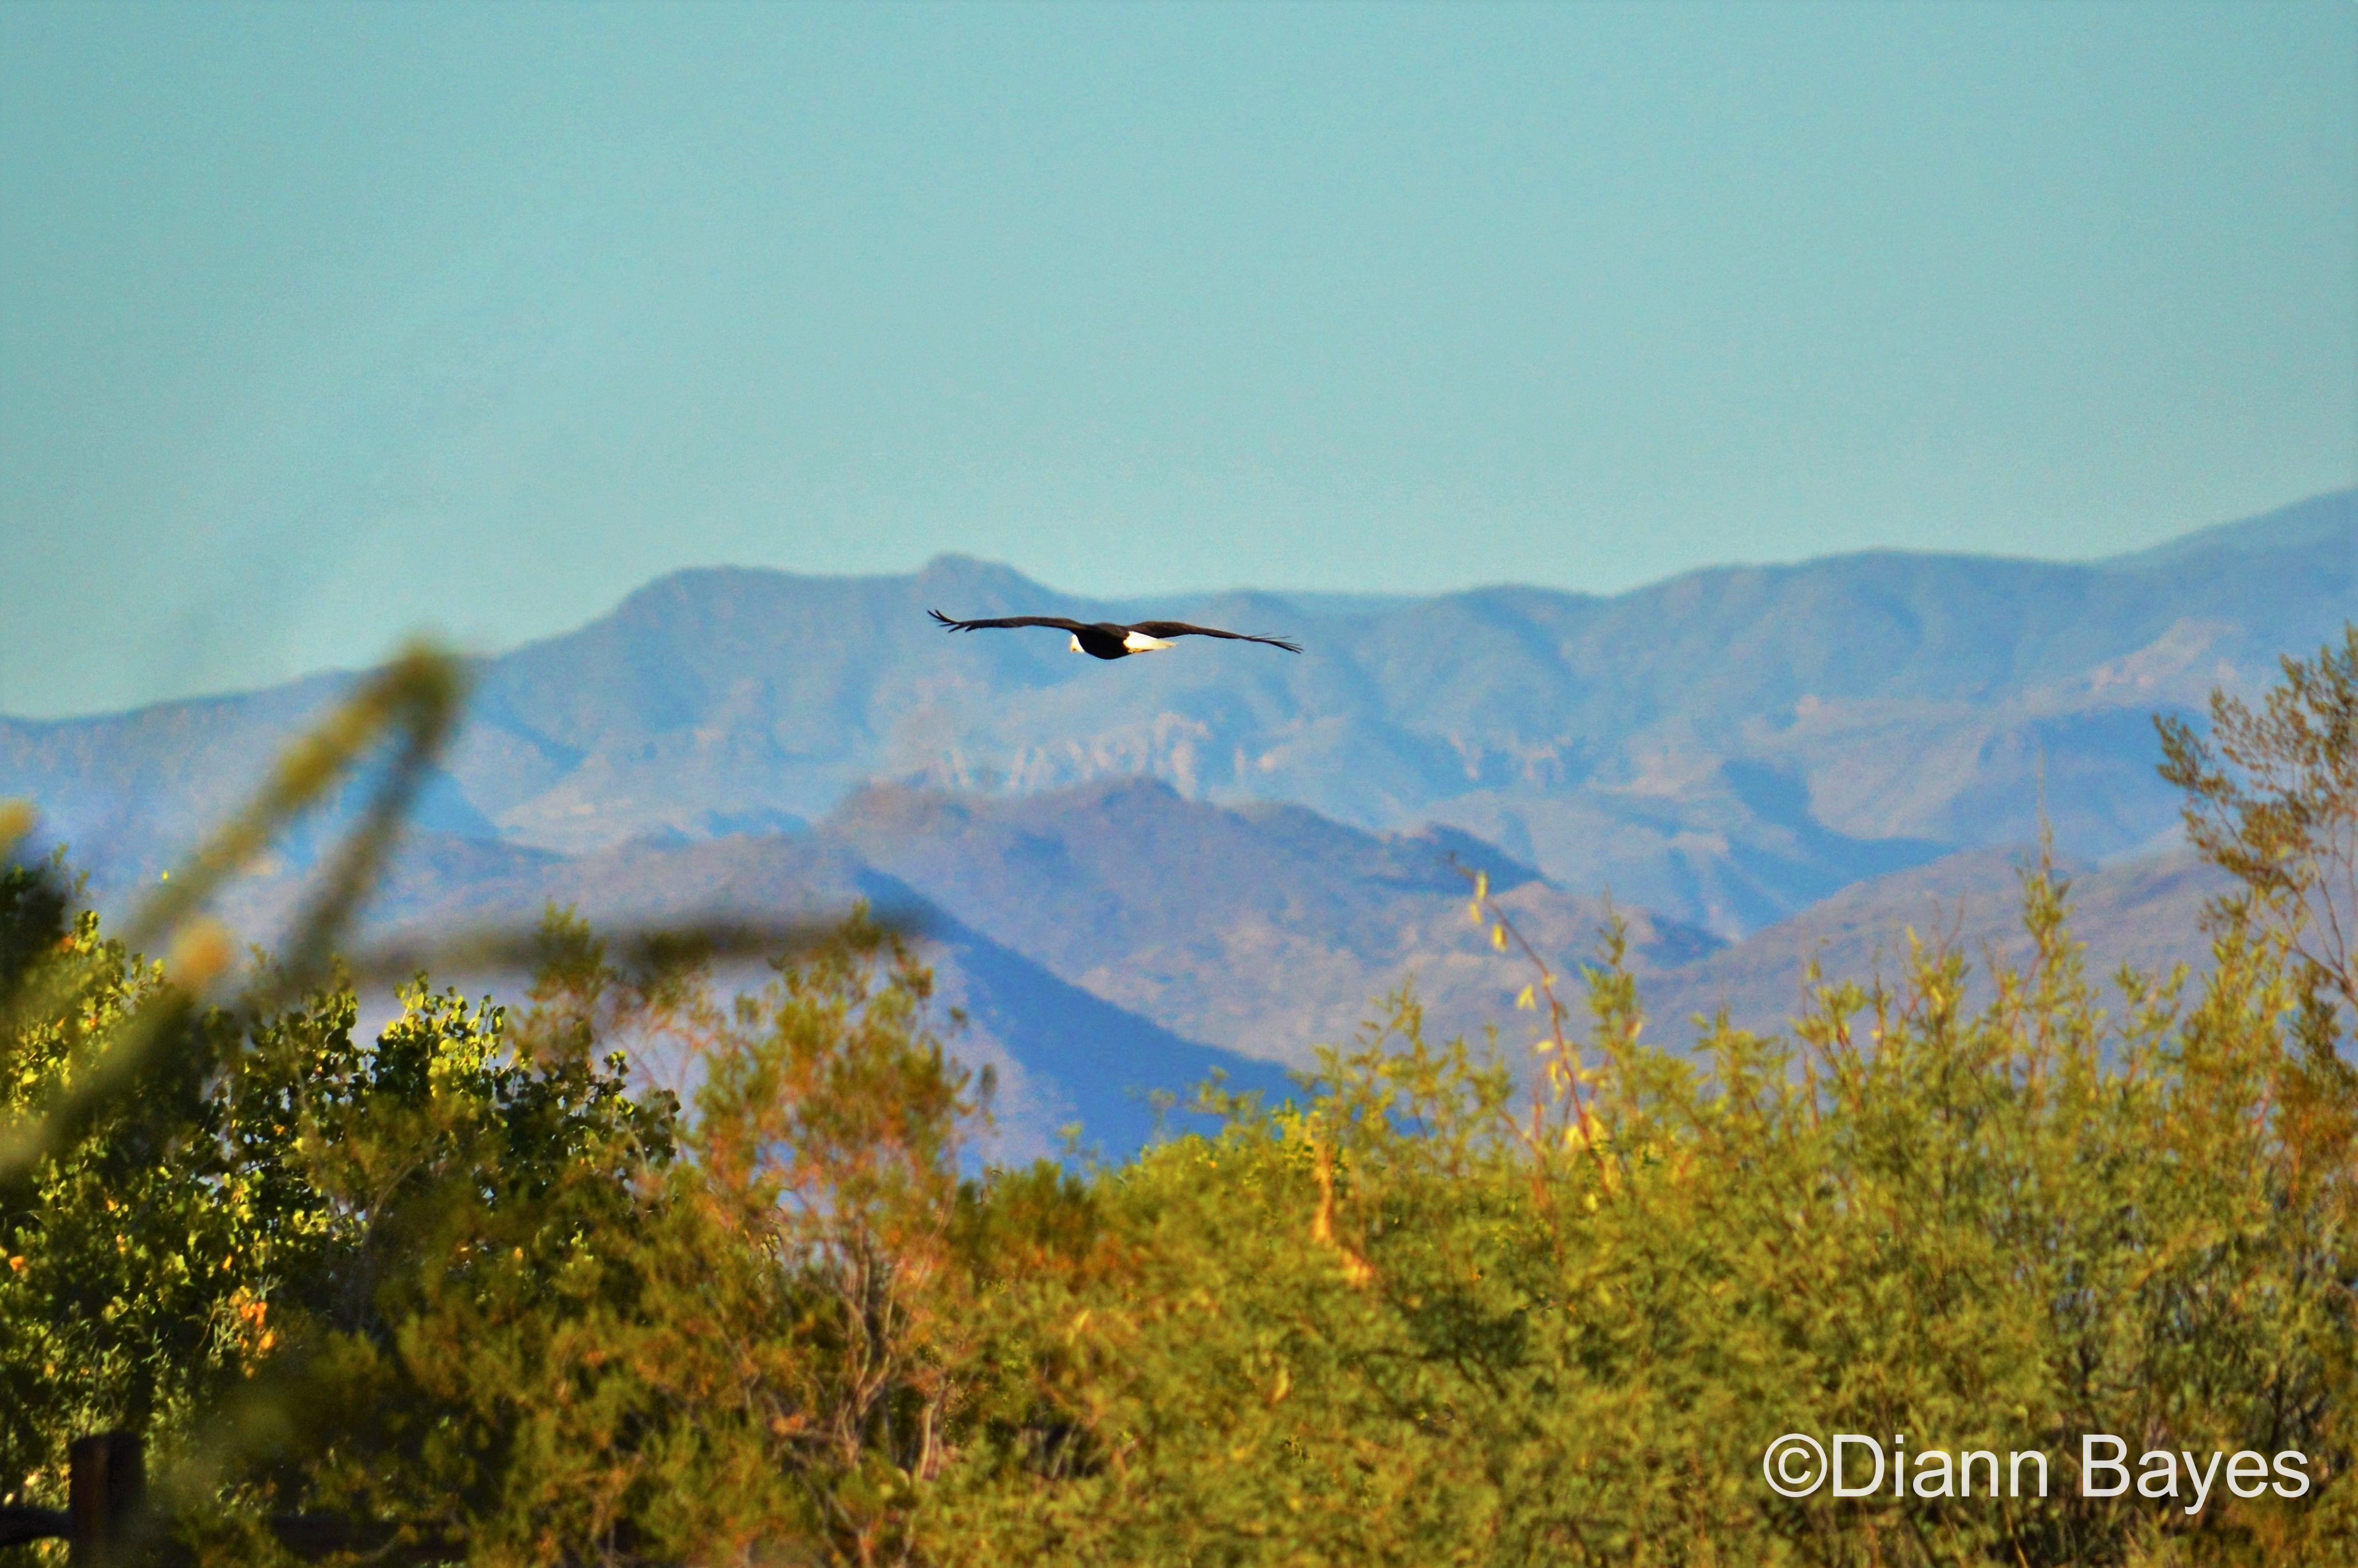 Eagle View RV Resort in Fort McDowell, Arizona www